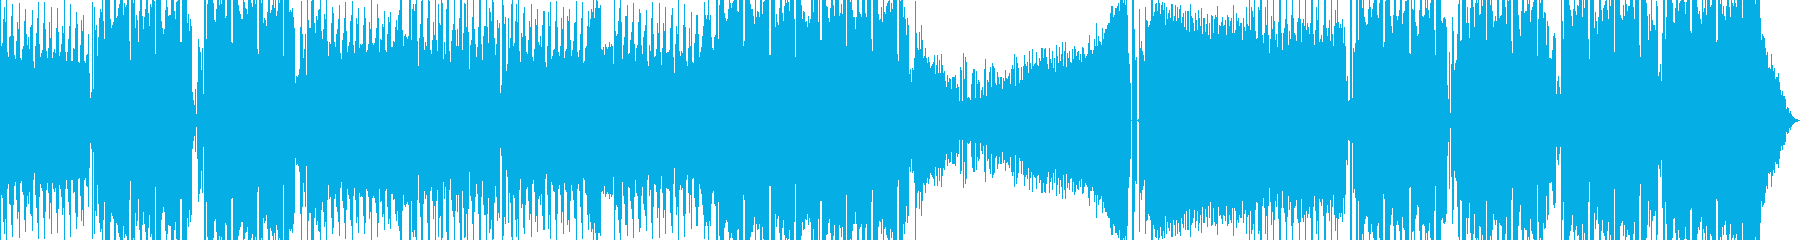 SFに合う激しめテクノミュージックの再生済みの波形